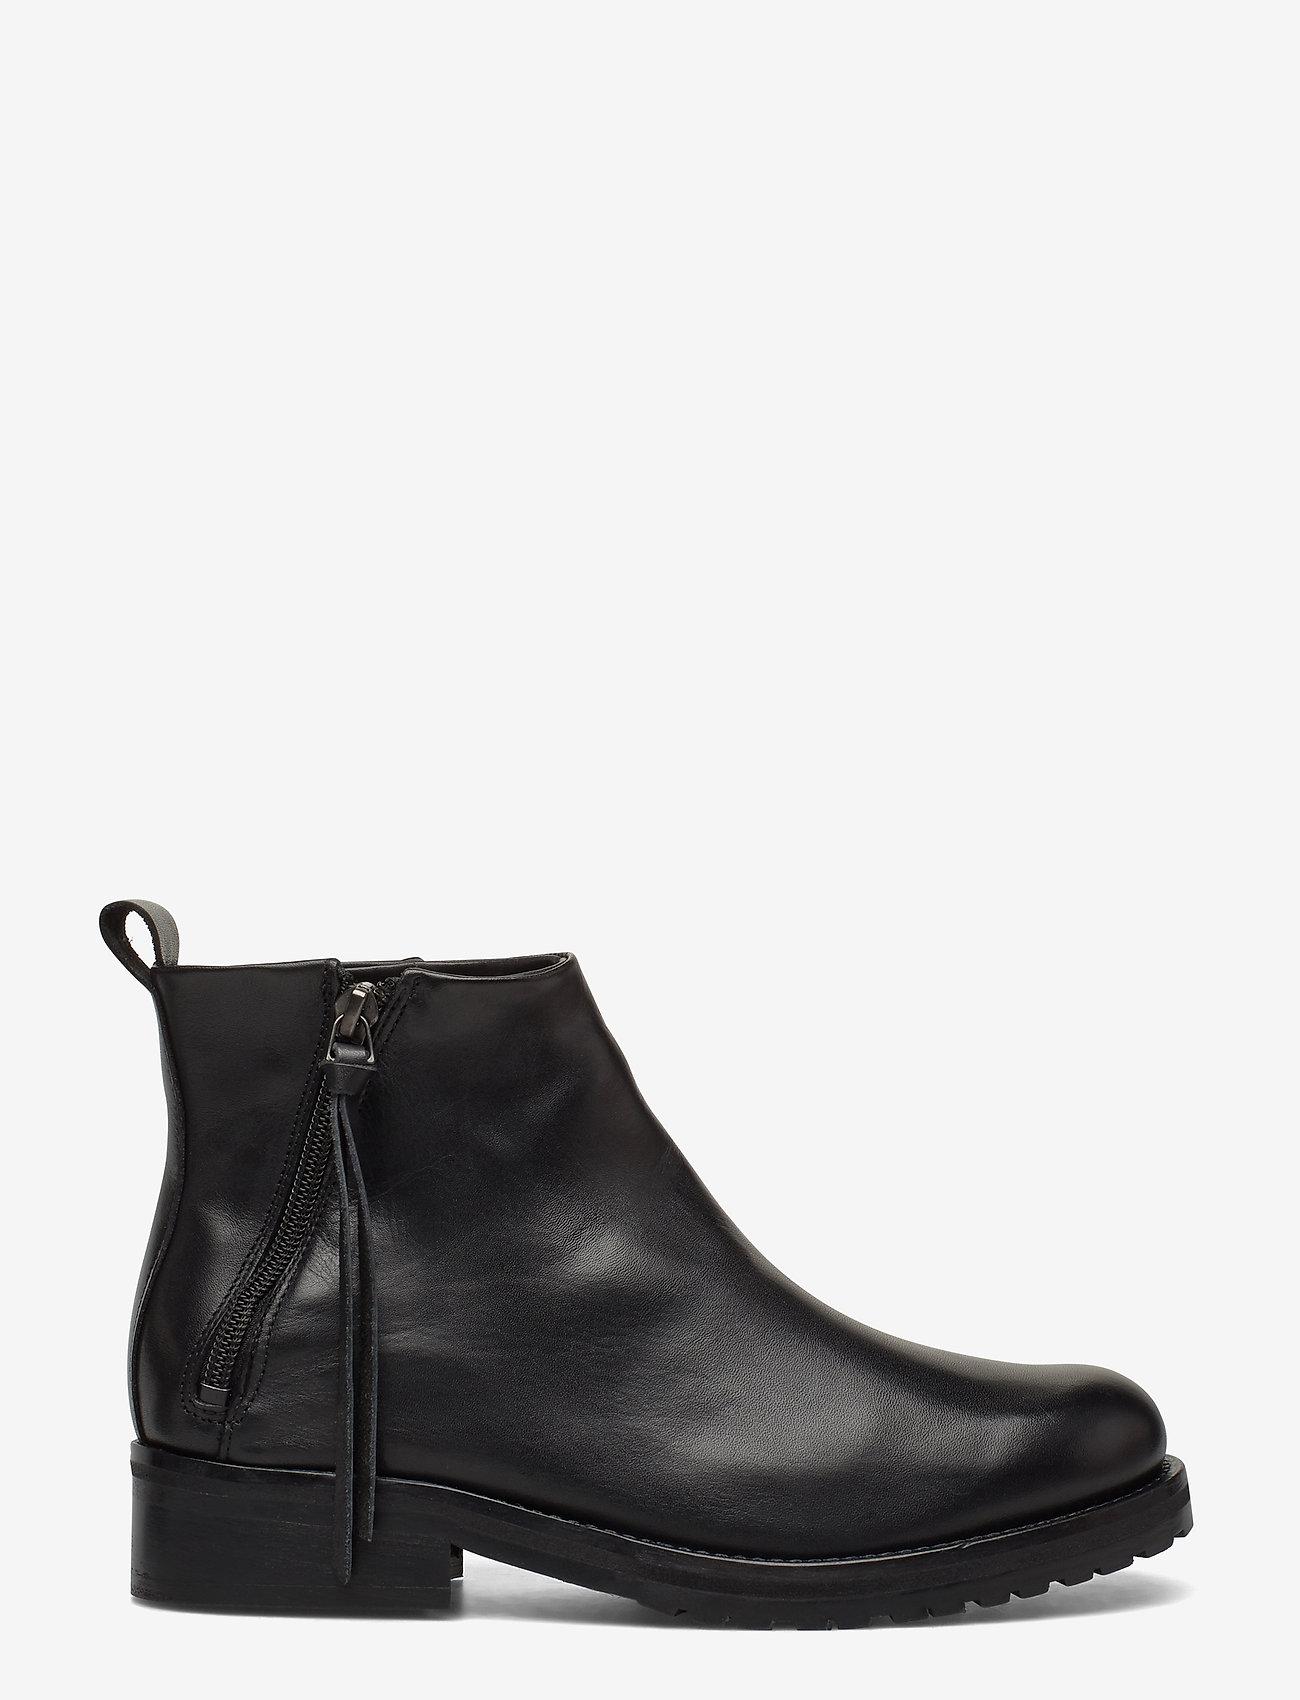 Royal RepubliQ - Ave Ankle Boot - Black - wysoki obcas - black - 1